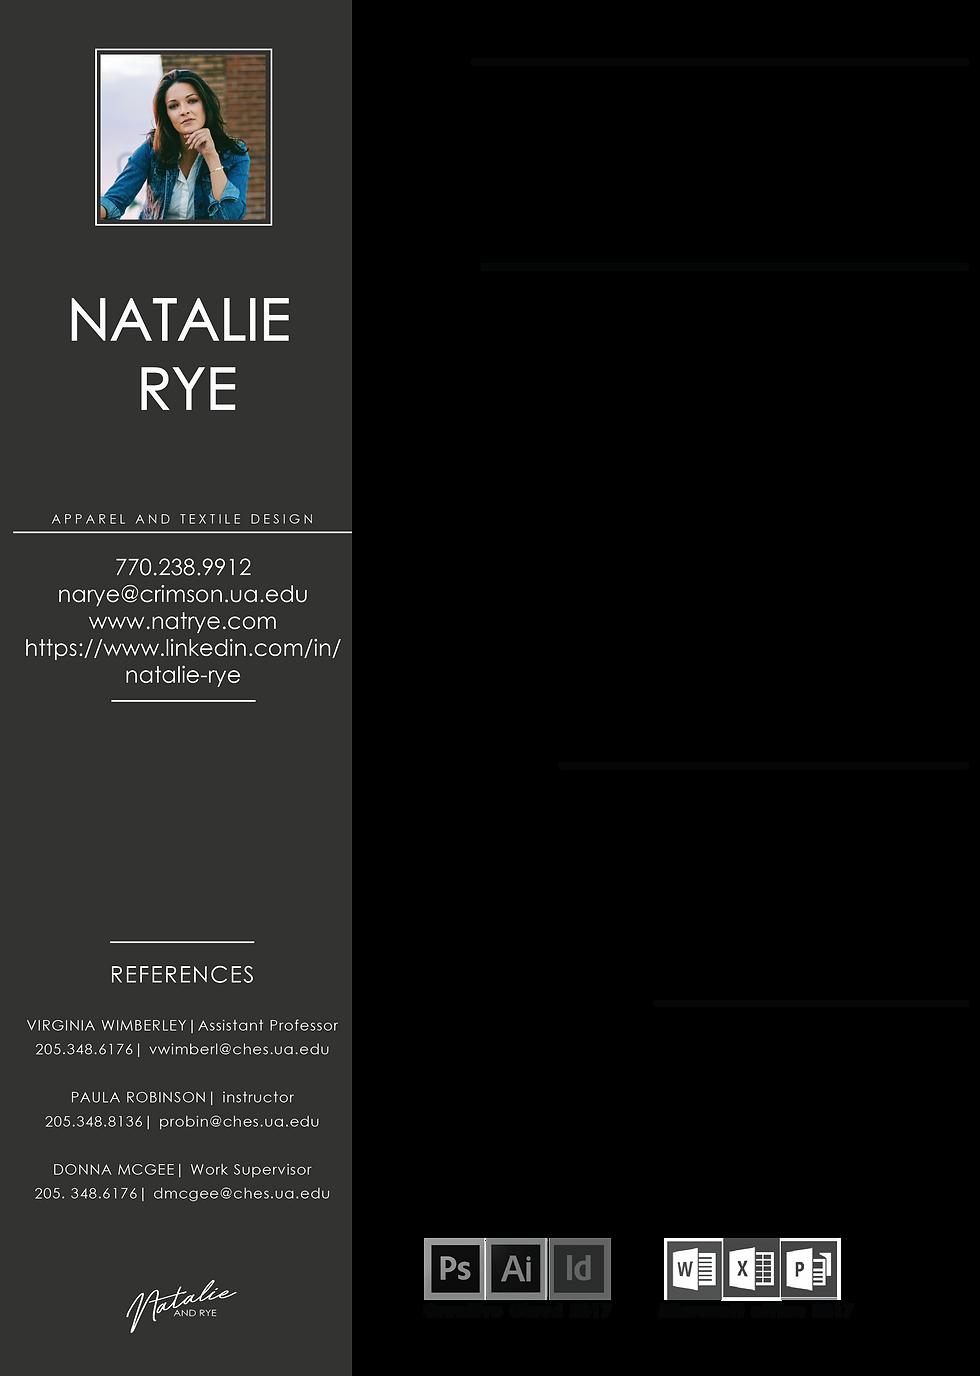 mysite | RESUME